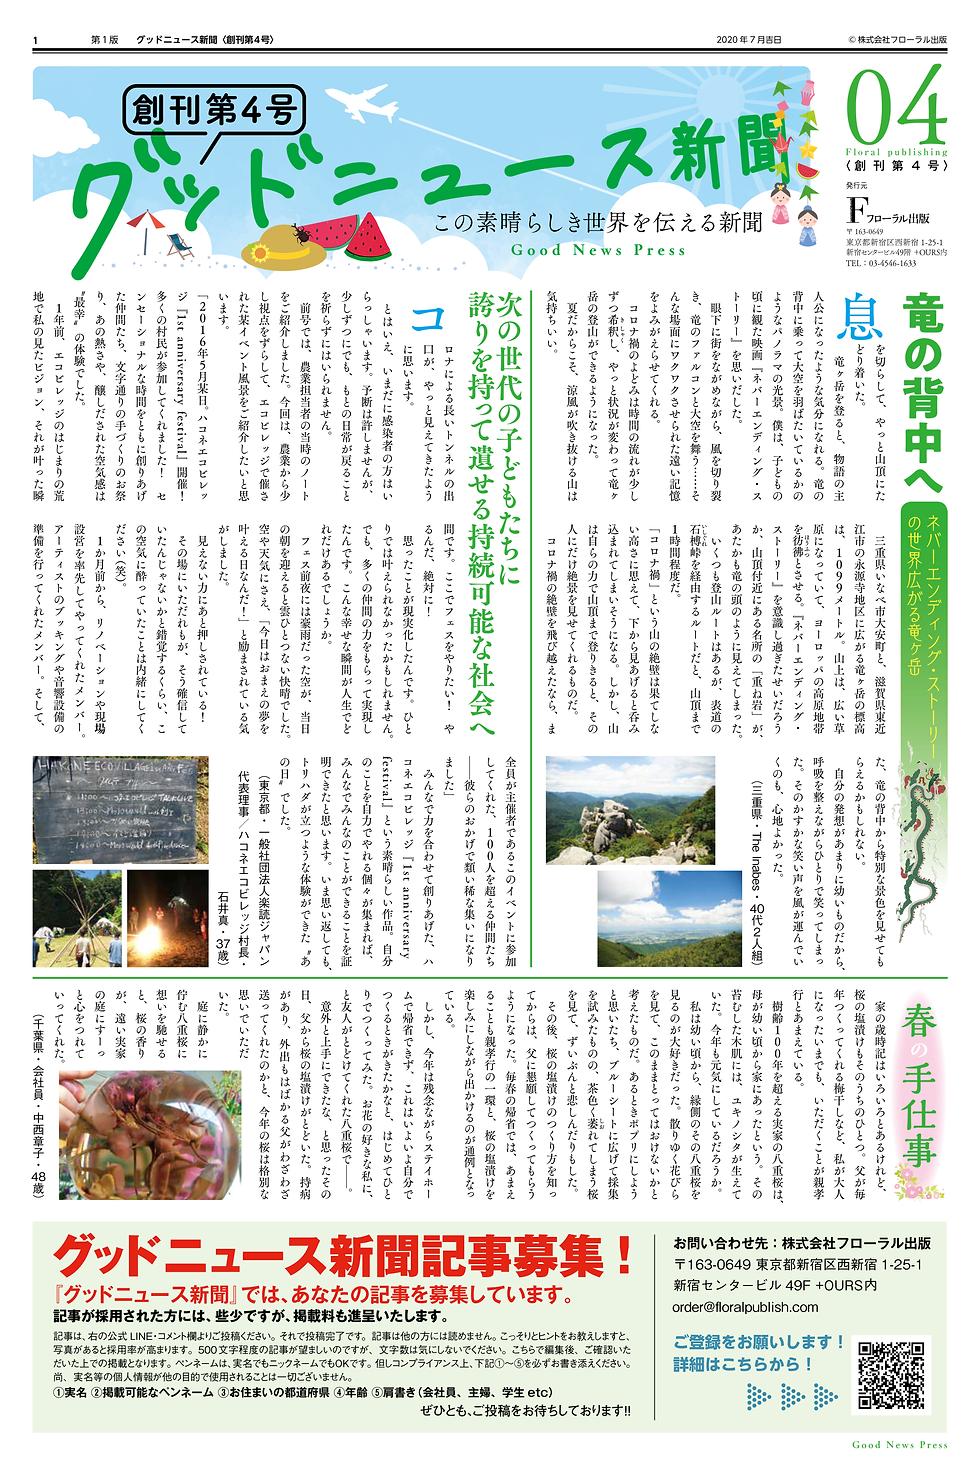 GNP4go-webyo_ページ_1.png